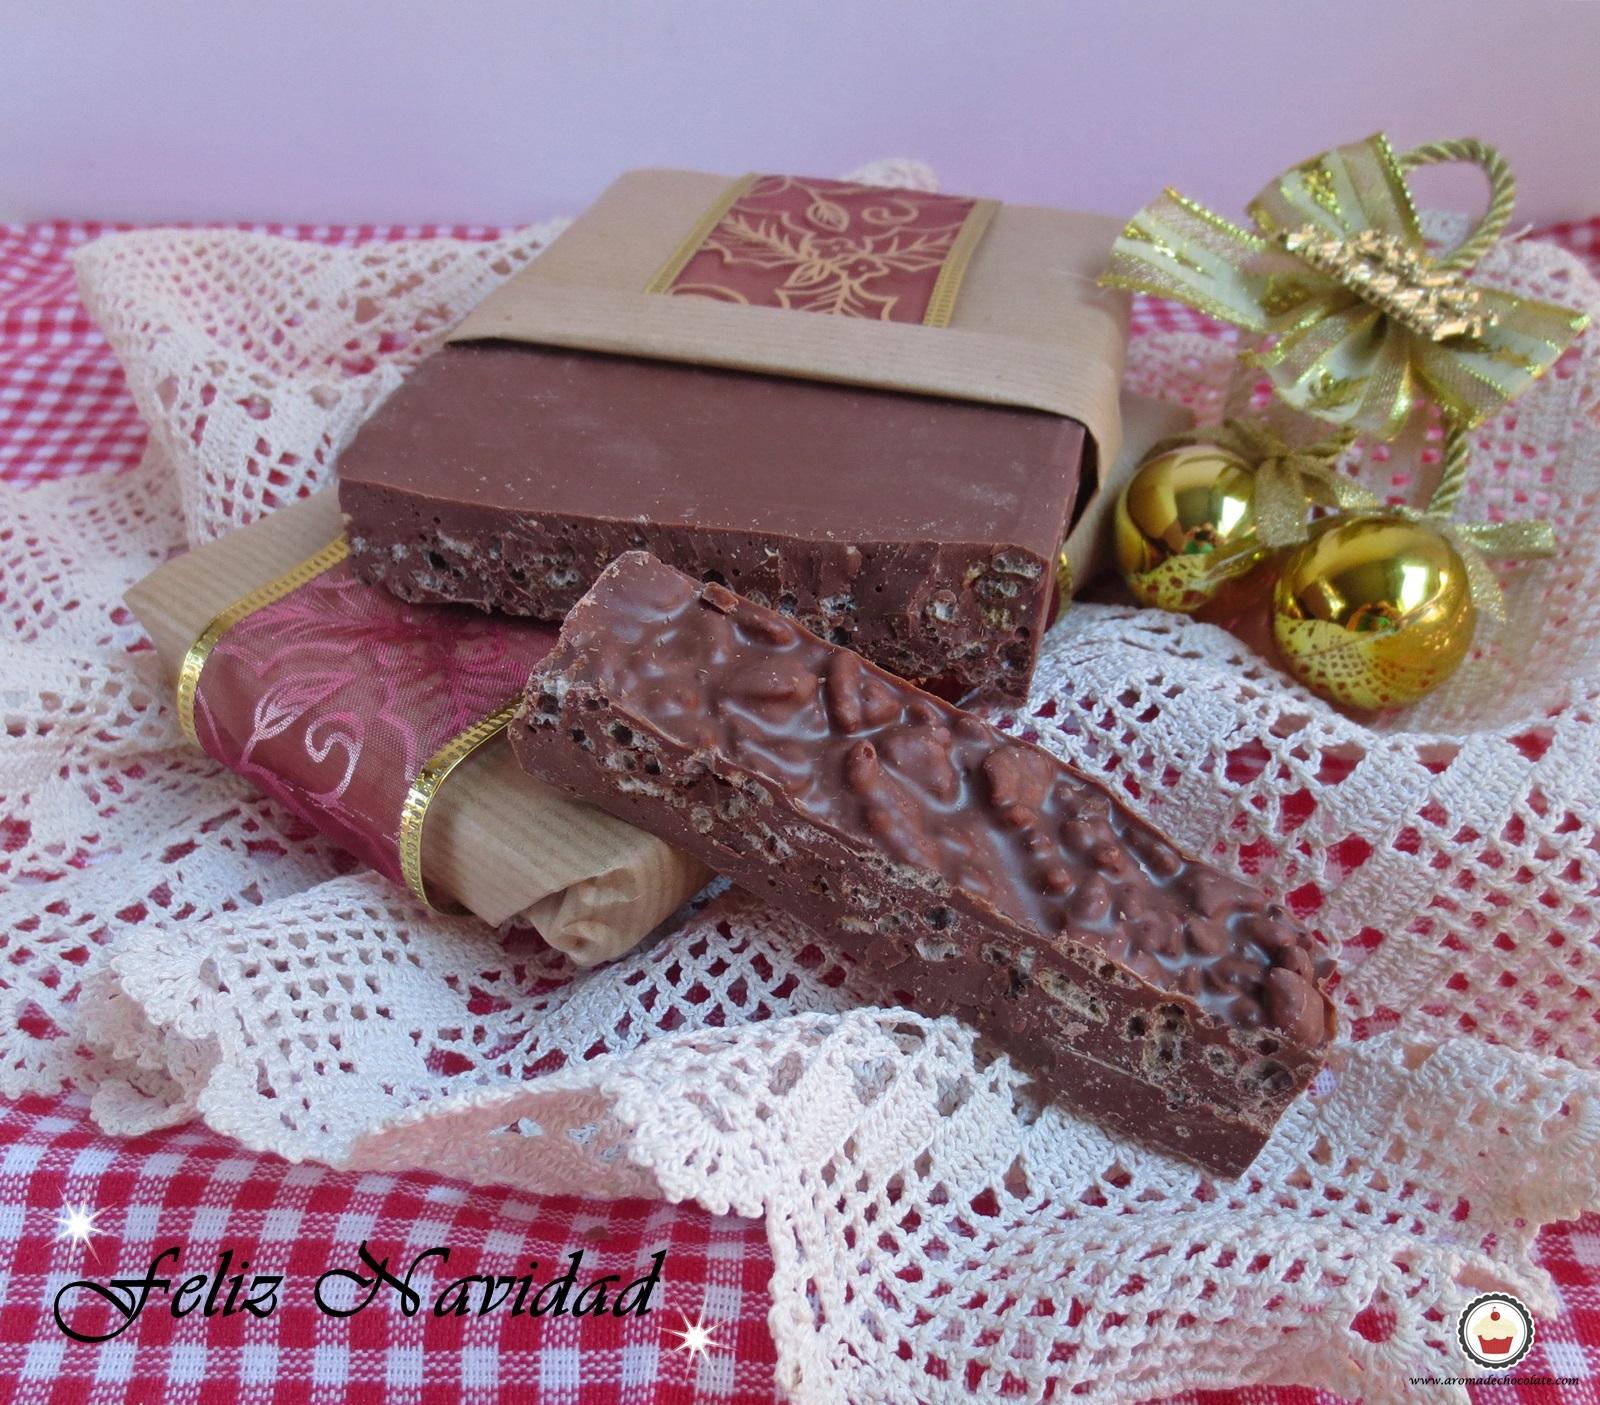 Turrón de chocolate. Aroma de chocolate